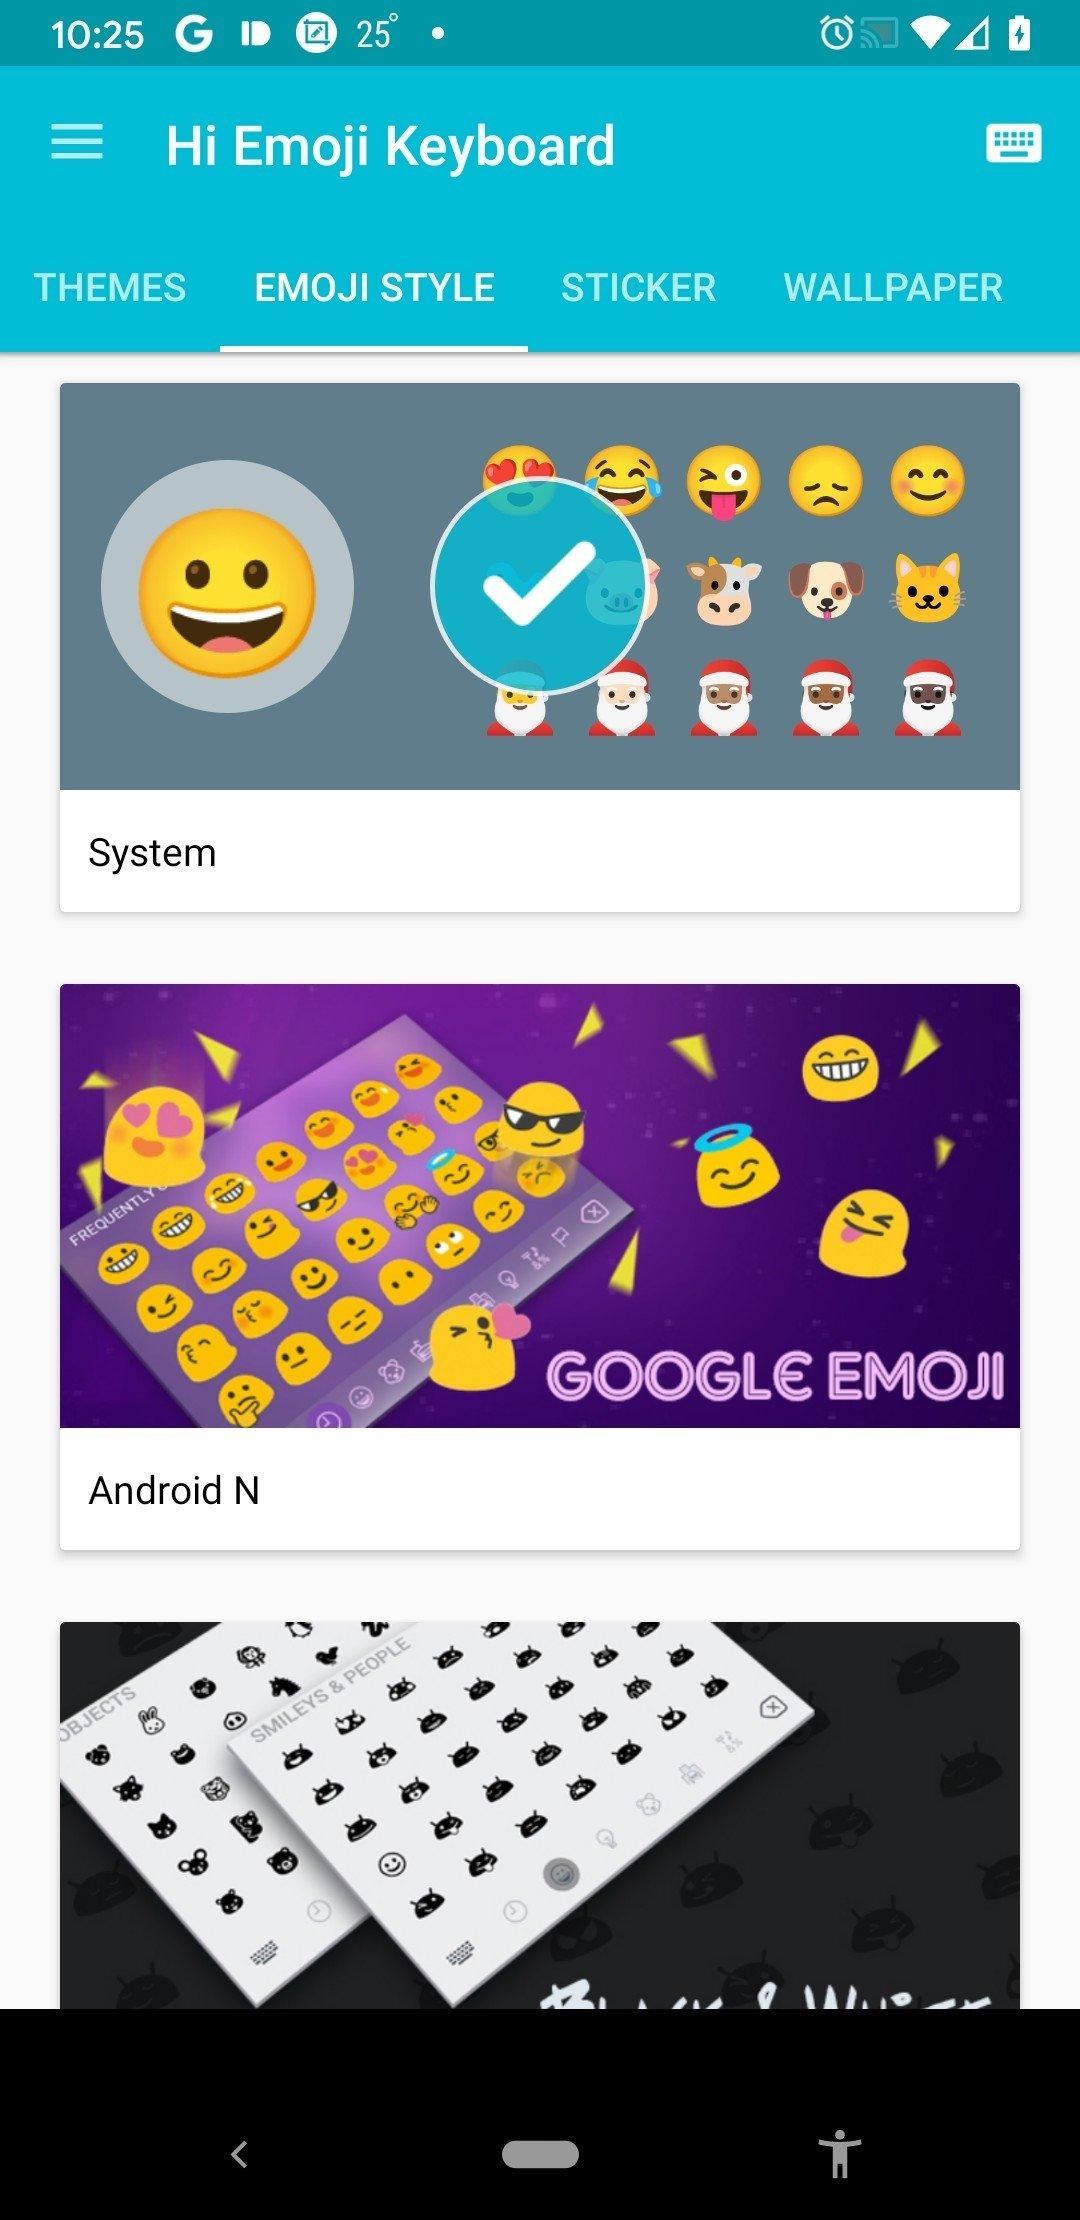 Hi Emoji Keyboard 2 0 7 - Download for Android APK Free